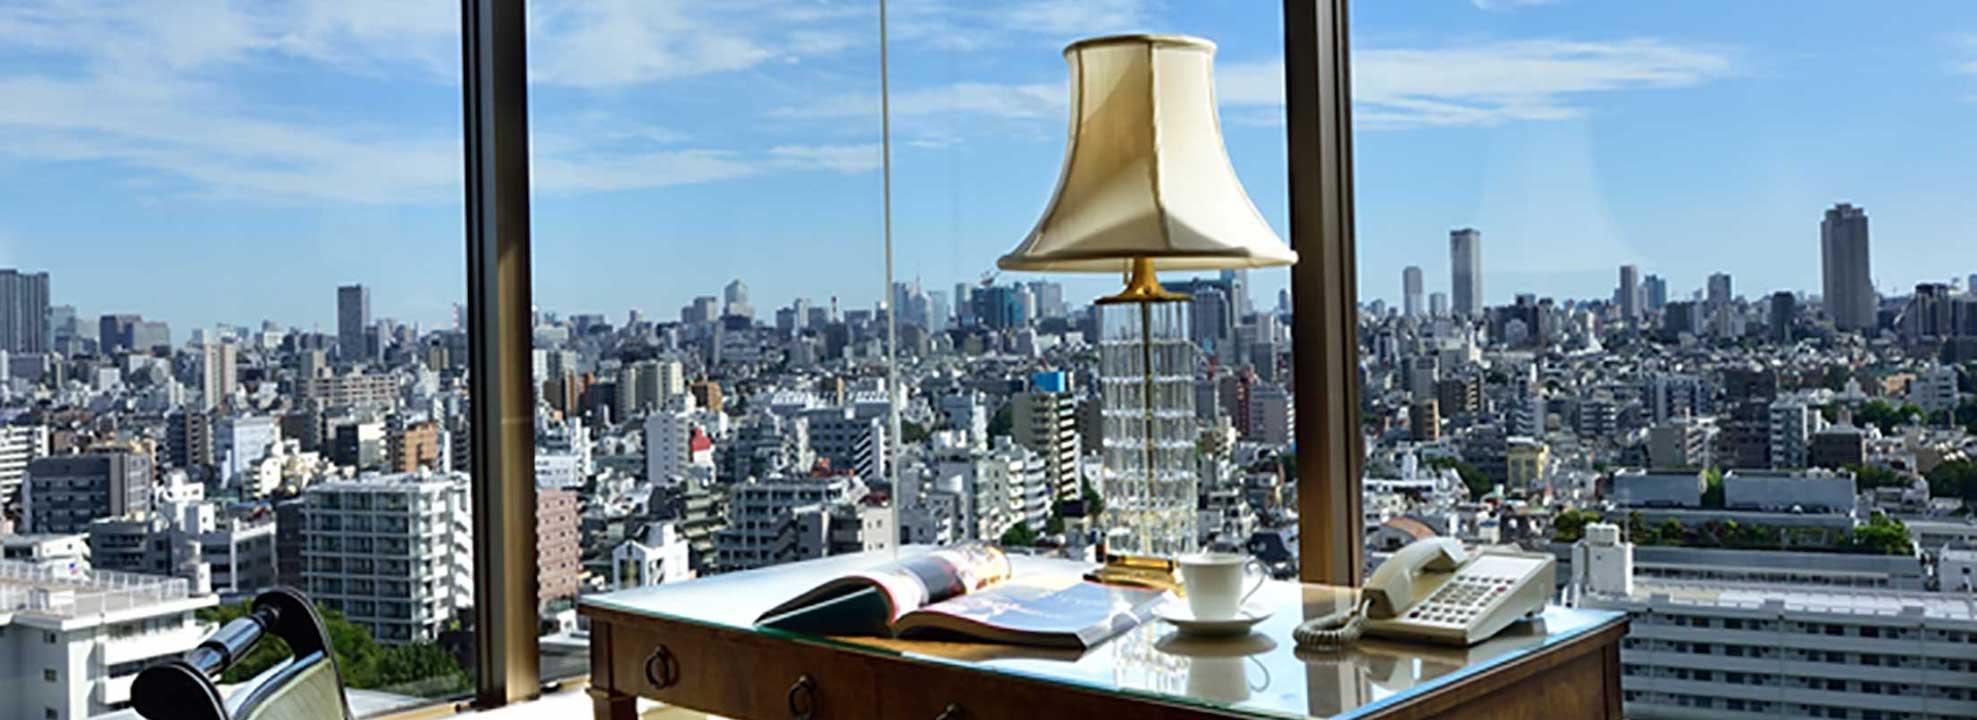 Hotel Chinzanso , Tokyo / Japan